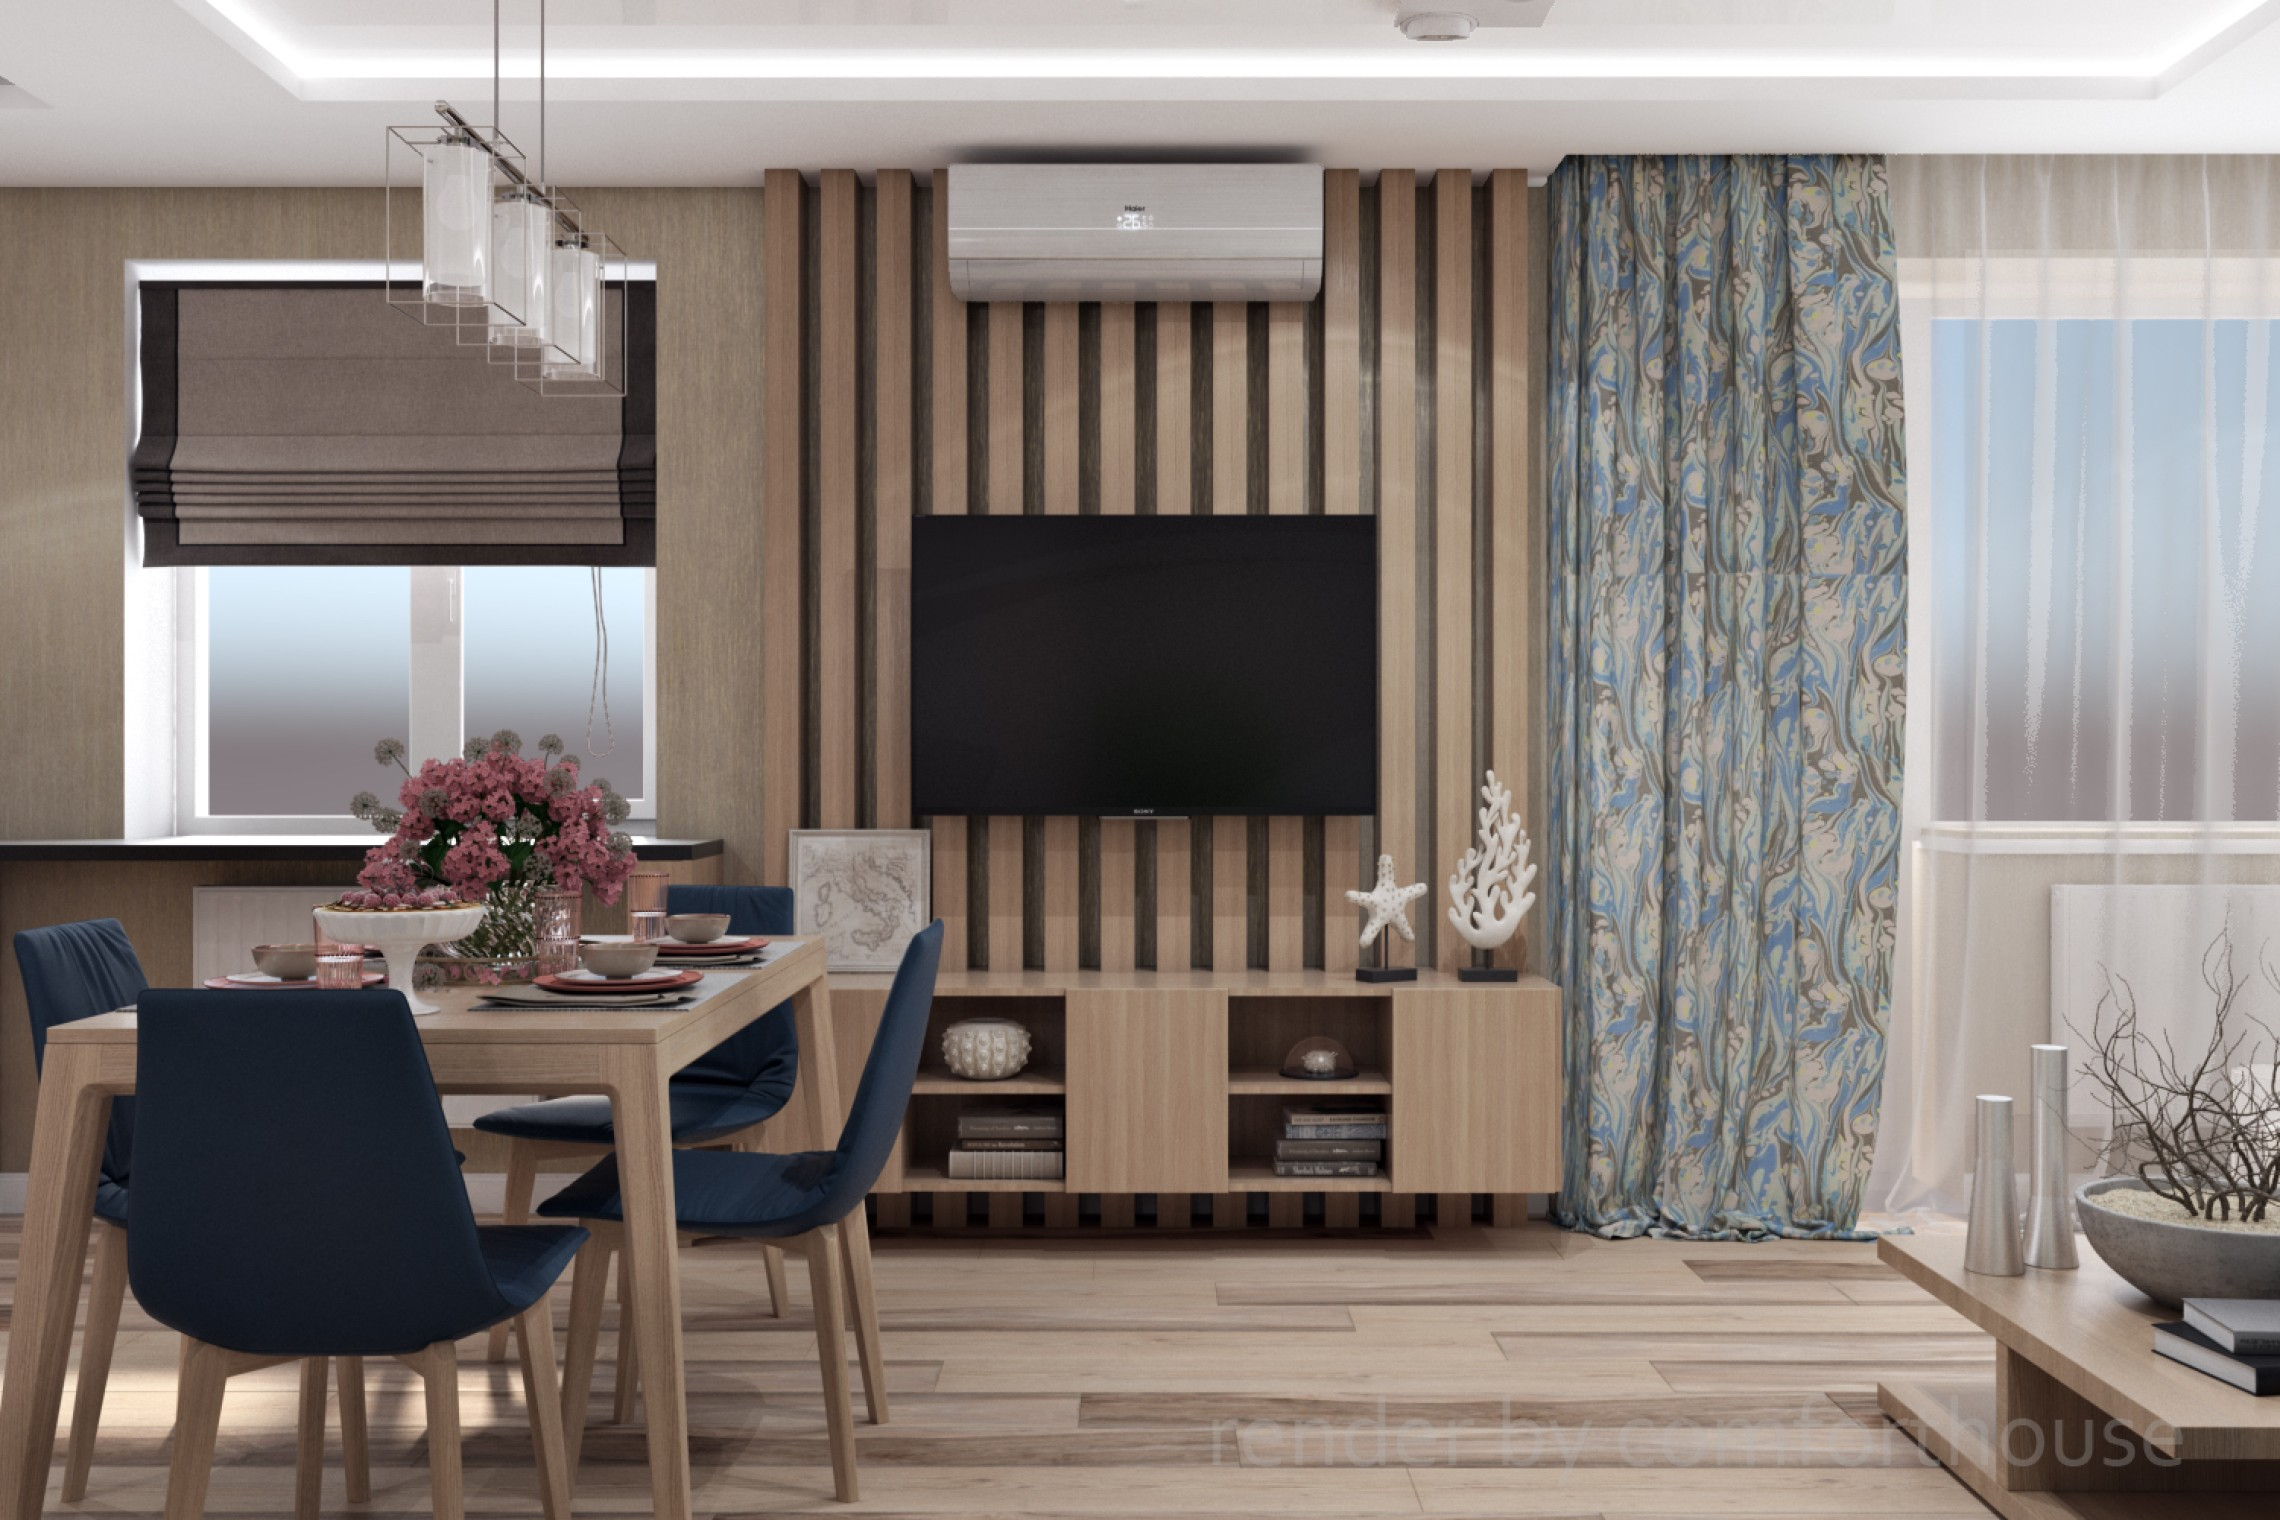 motley interior design